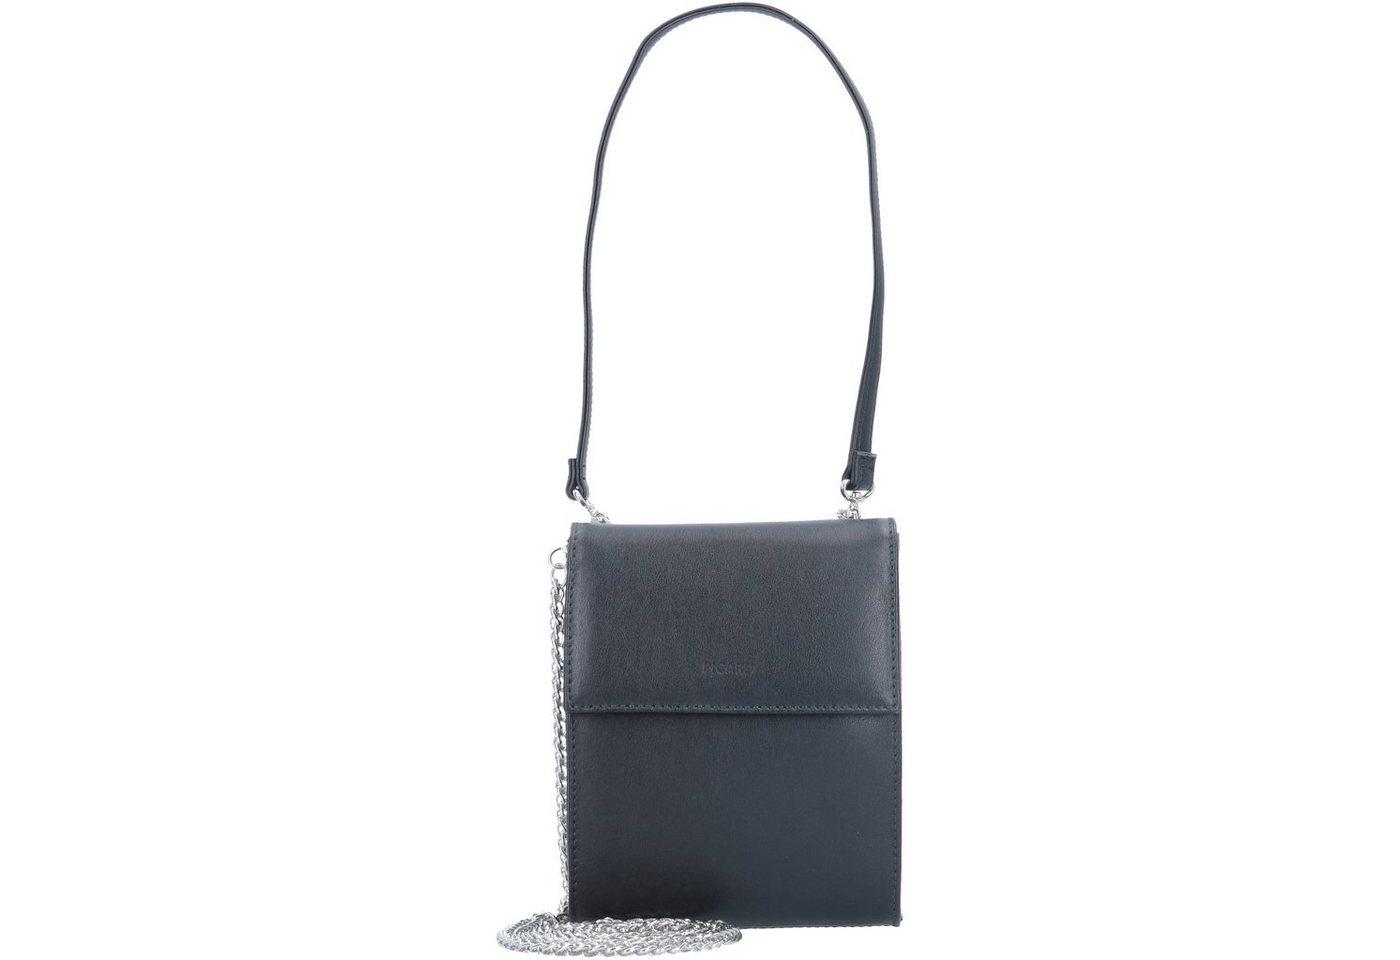 Damen Picard Auguri Mini Bag Schultertasche Leder 13 cm schwarz | 04056278053954